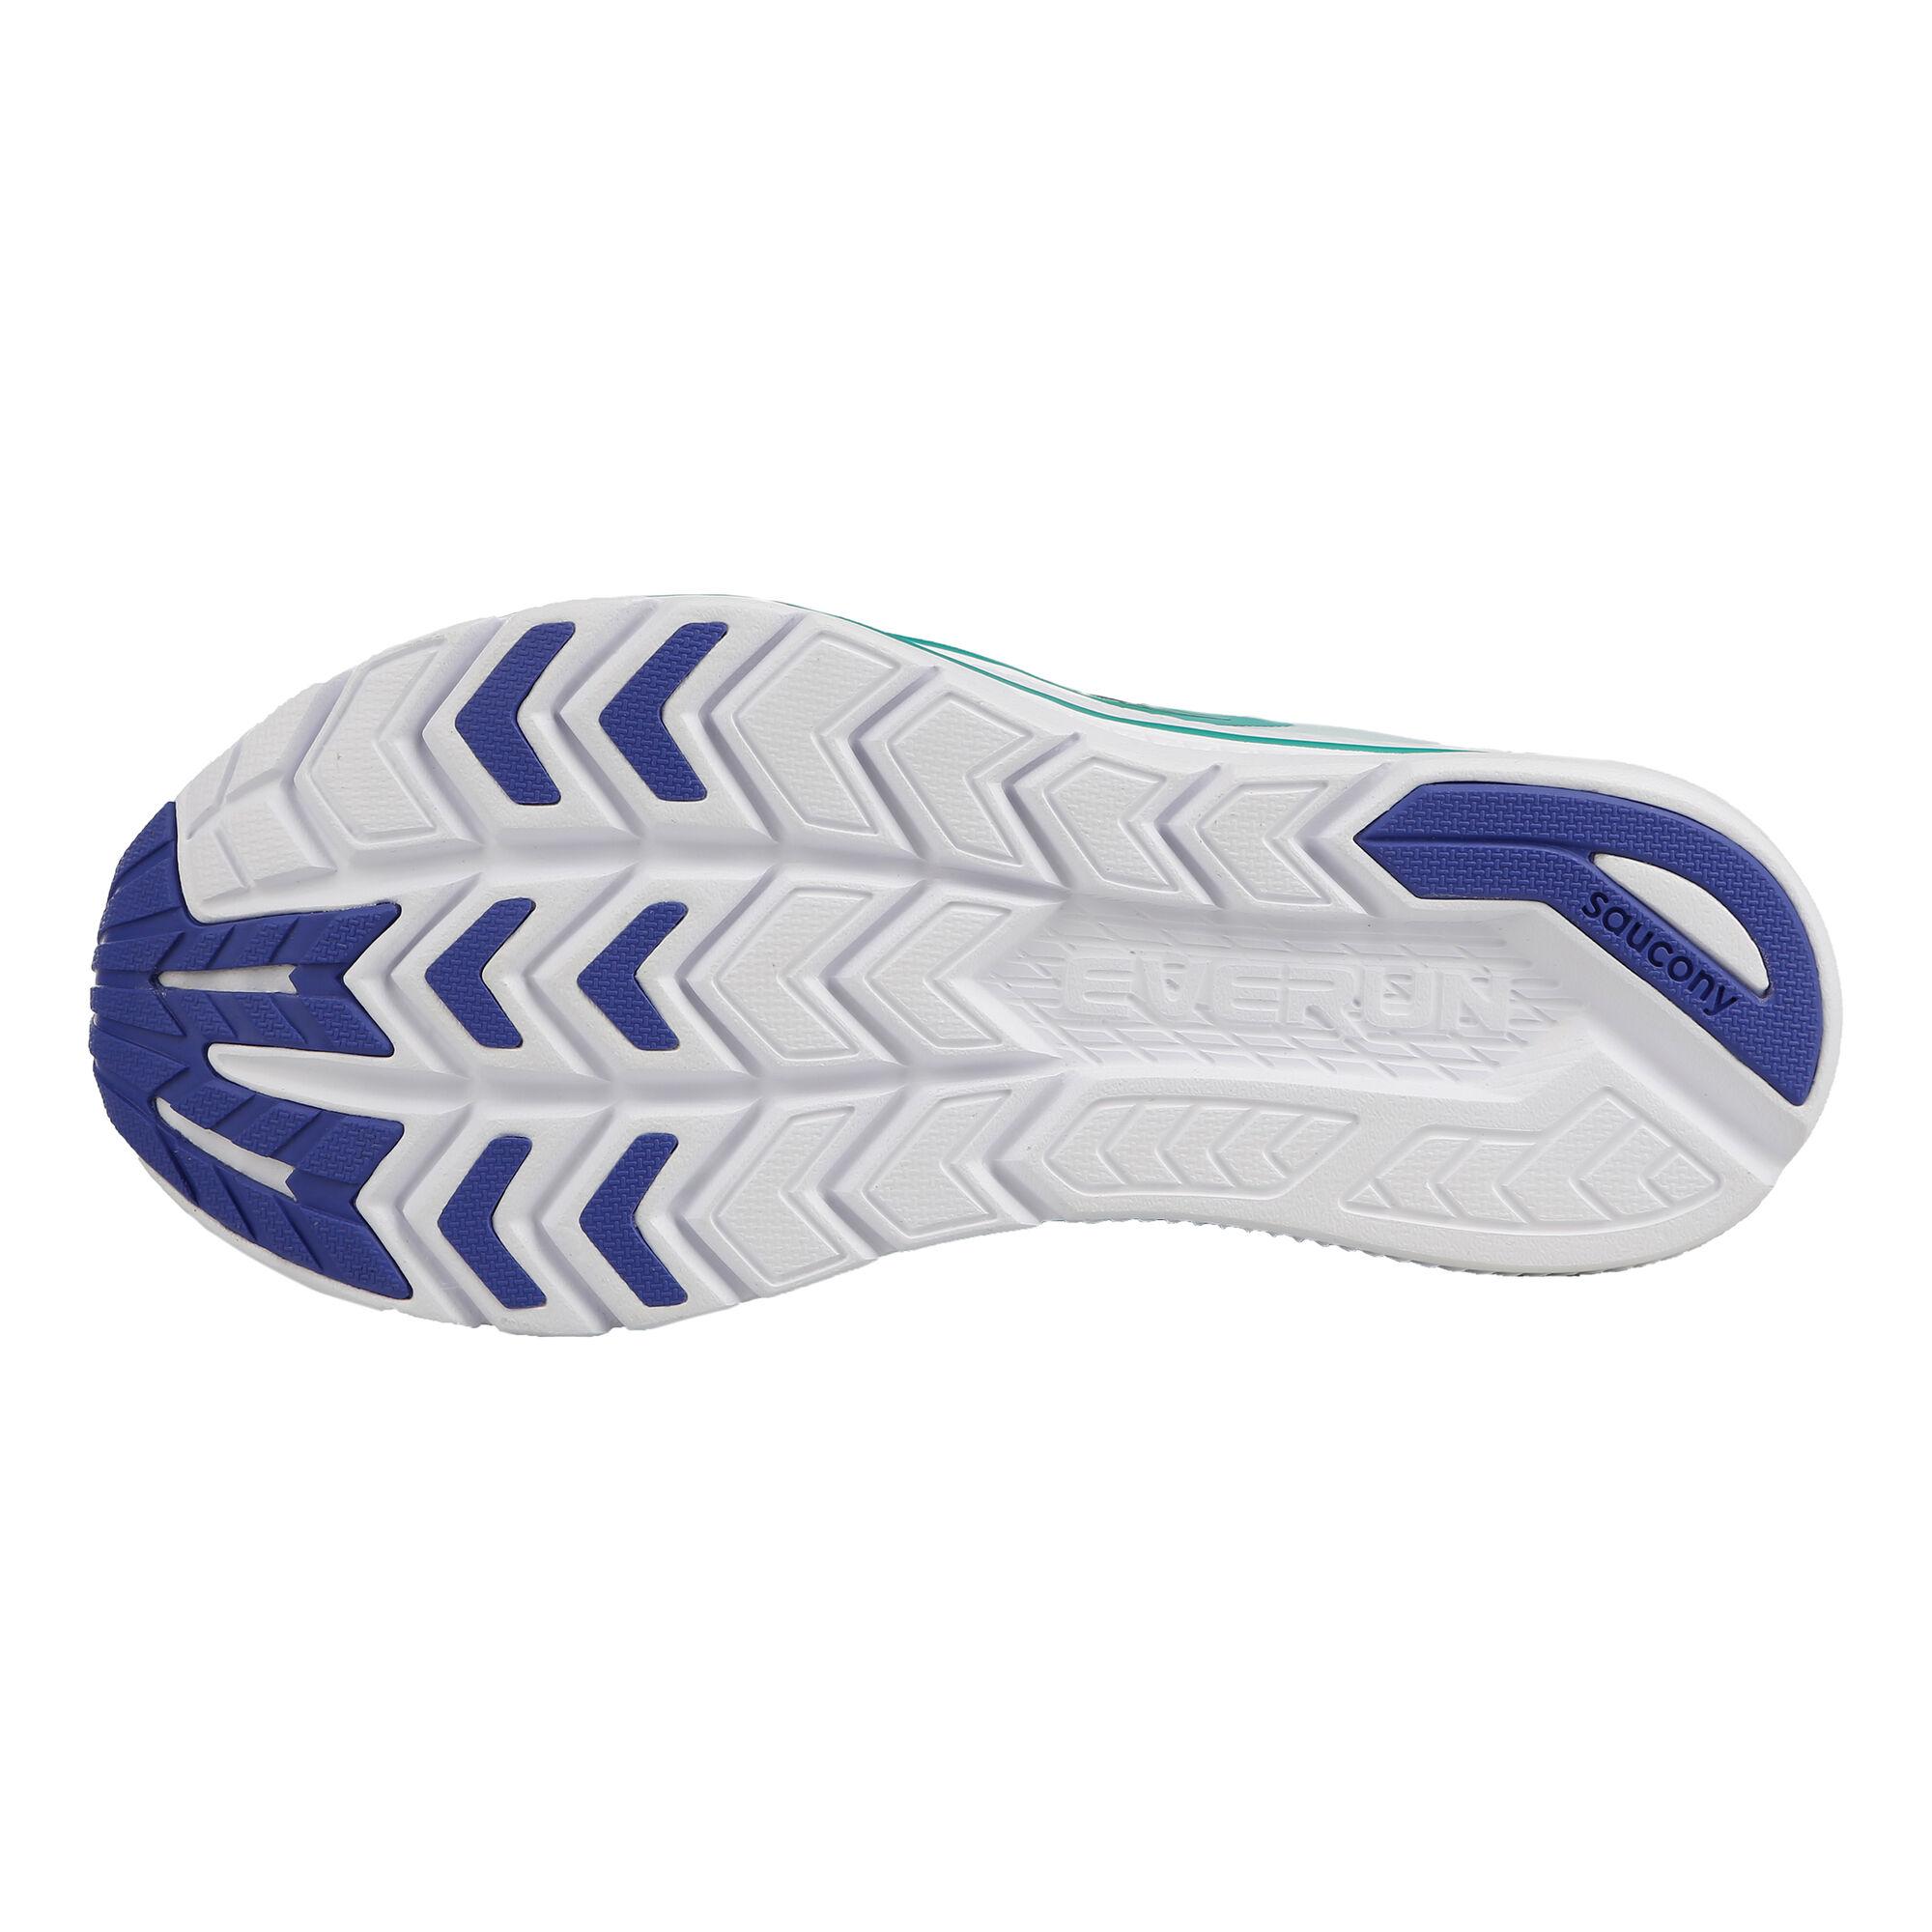 5fd00baf Saucony Kinvara 9 Neutral Running Shoe Women - Mint, White